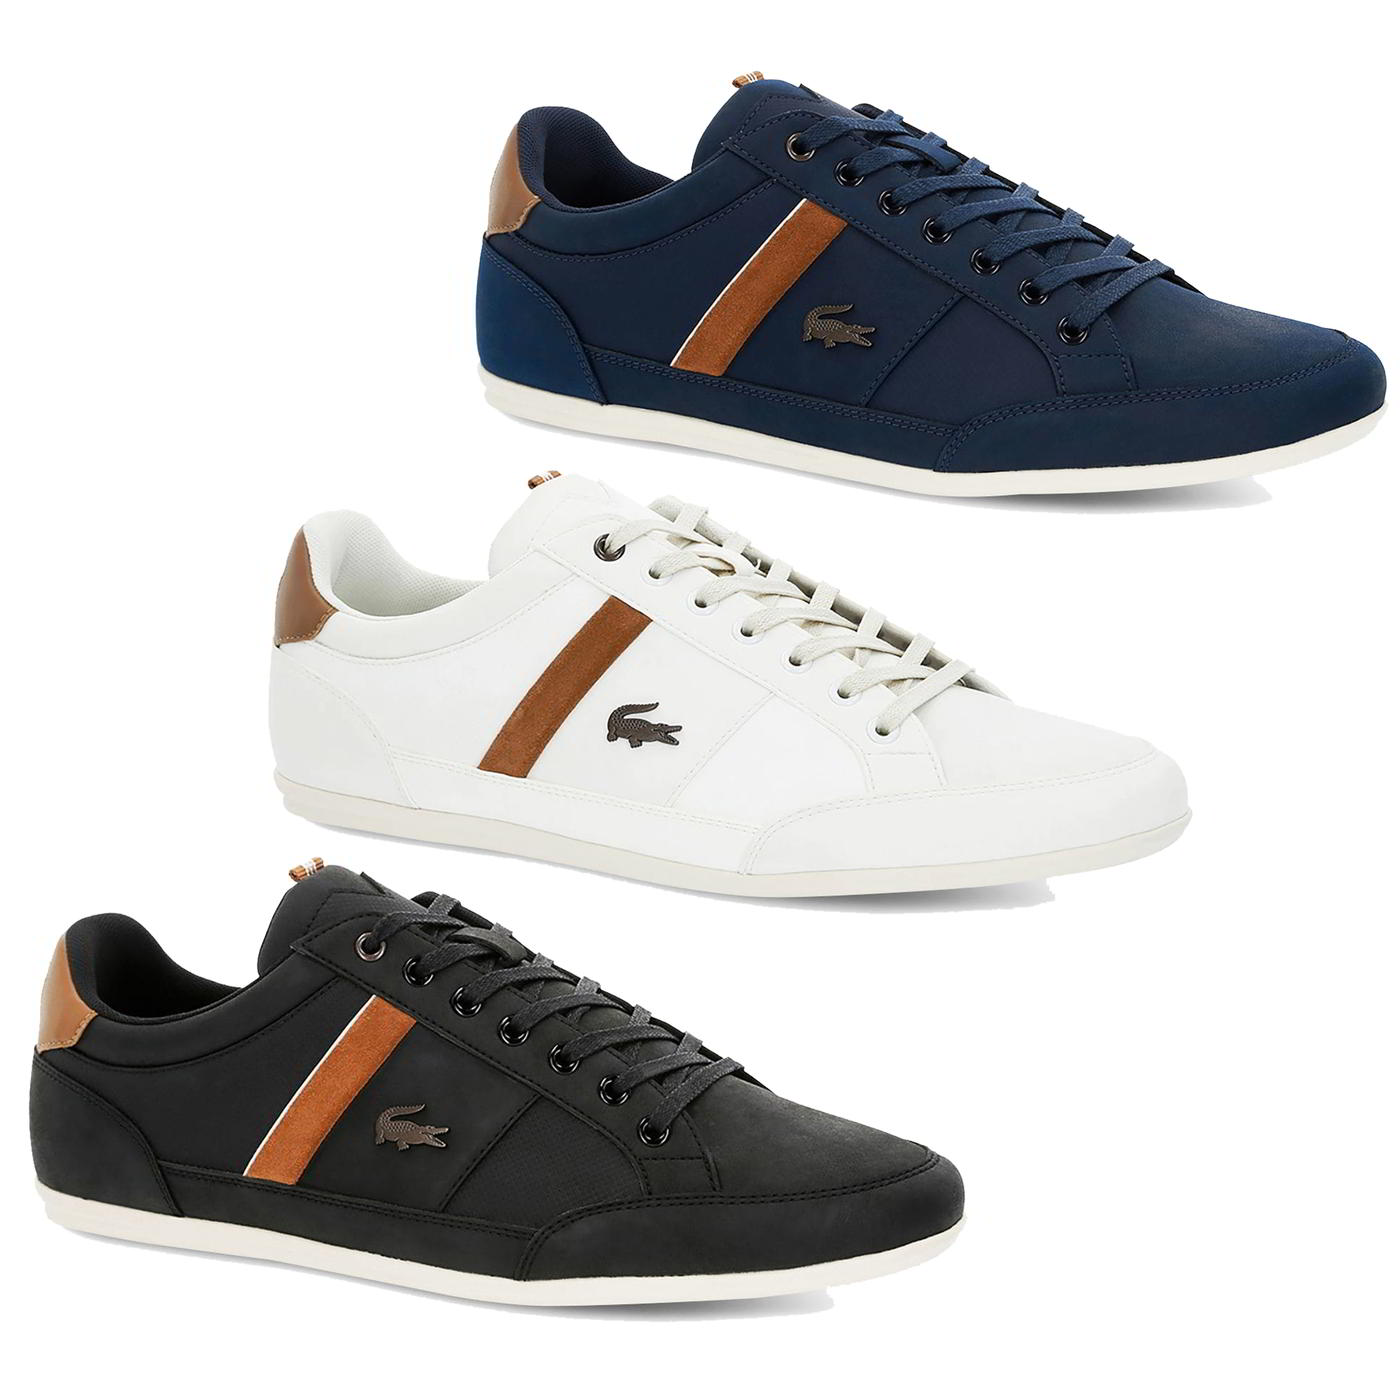 a41120a6d4beb Lacoste Chaymon 119 5 Mens White Black Blue Leather Trainers Shoes ...